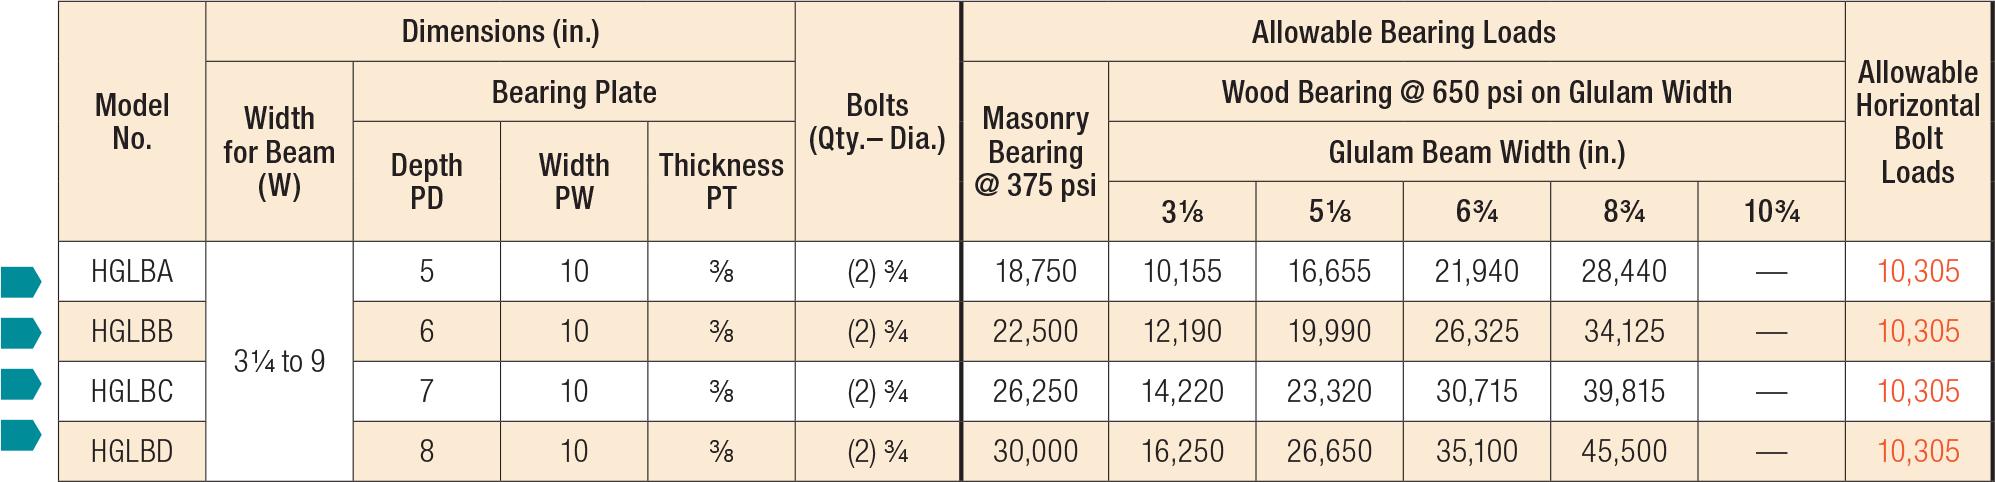 GLB/HGLB Beam Seats Load Table